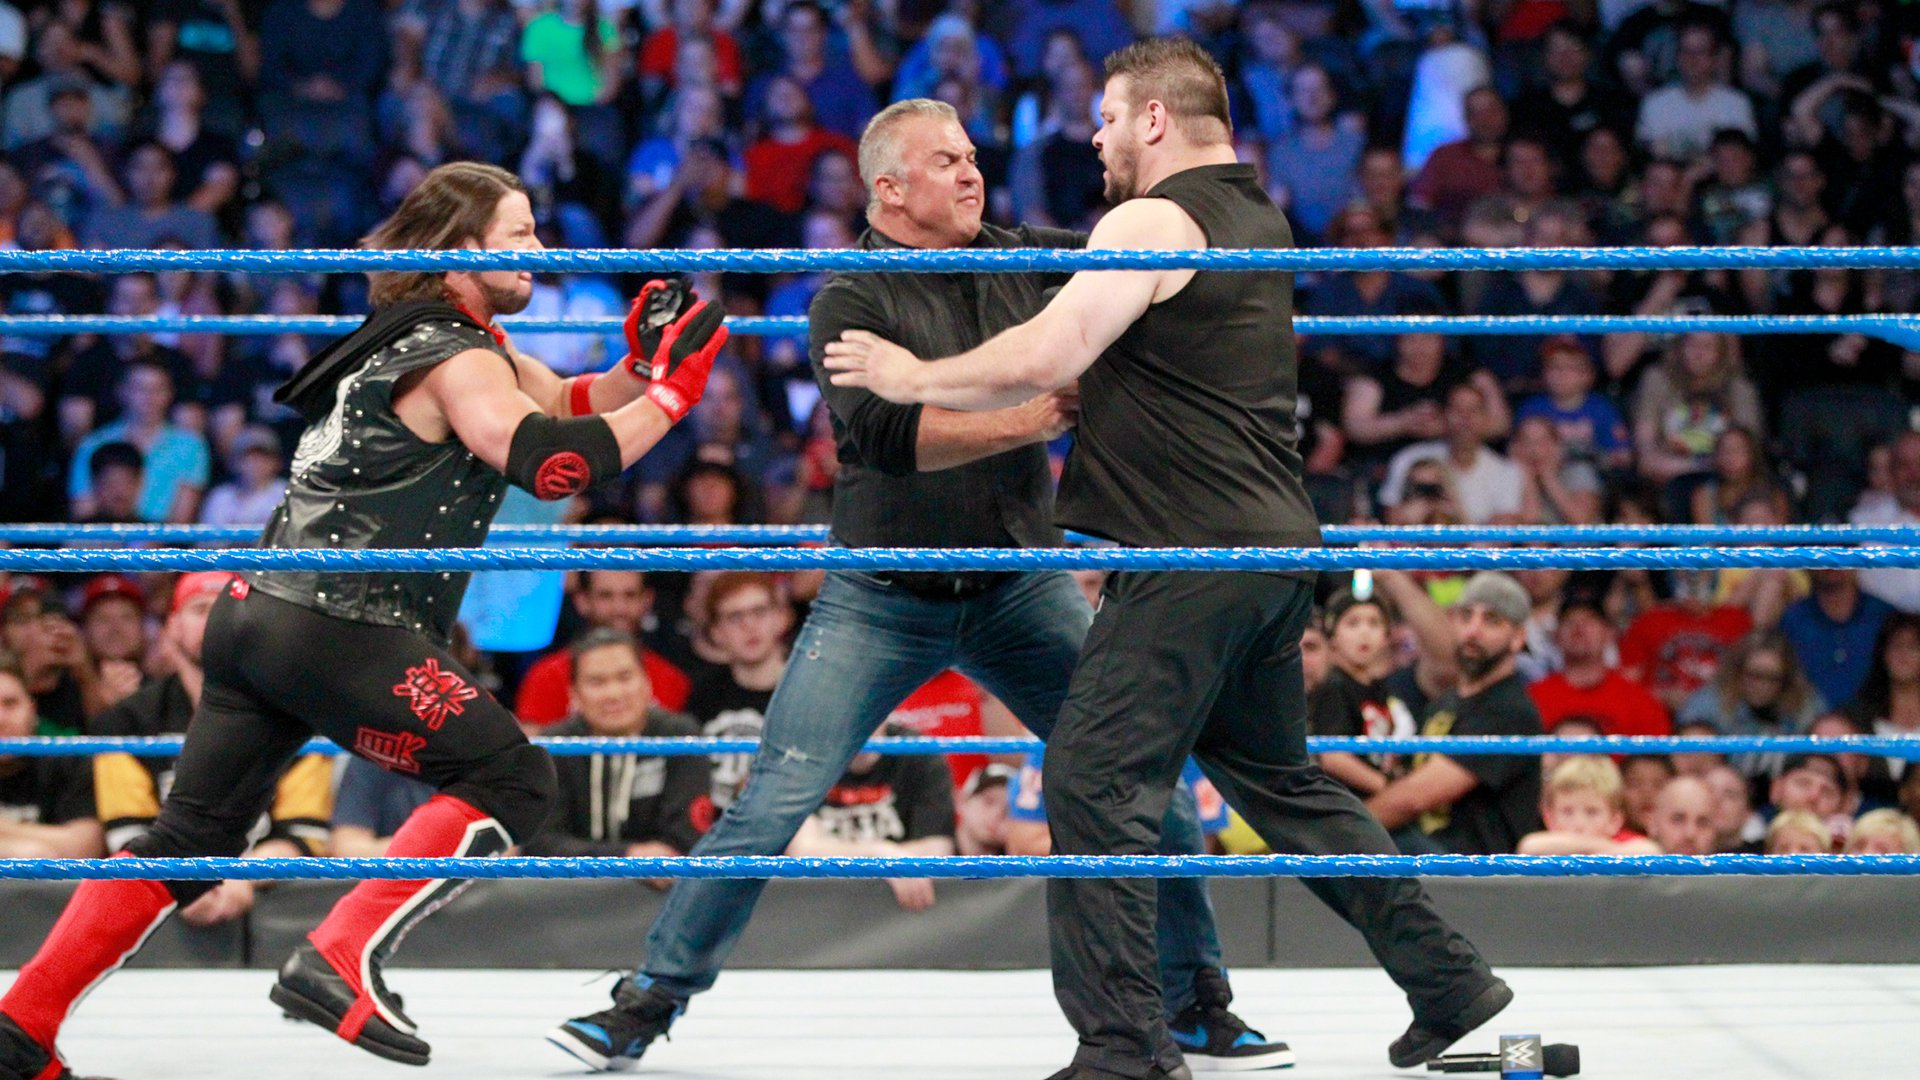 A shoving match ensues...